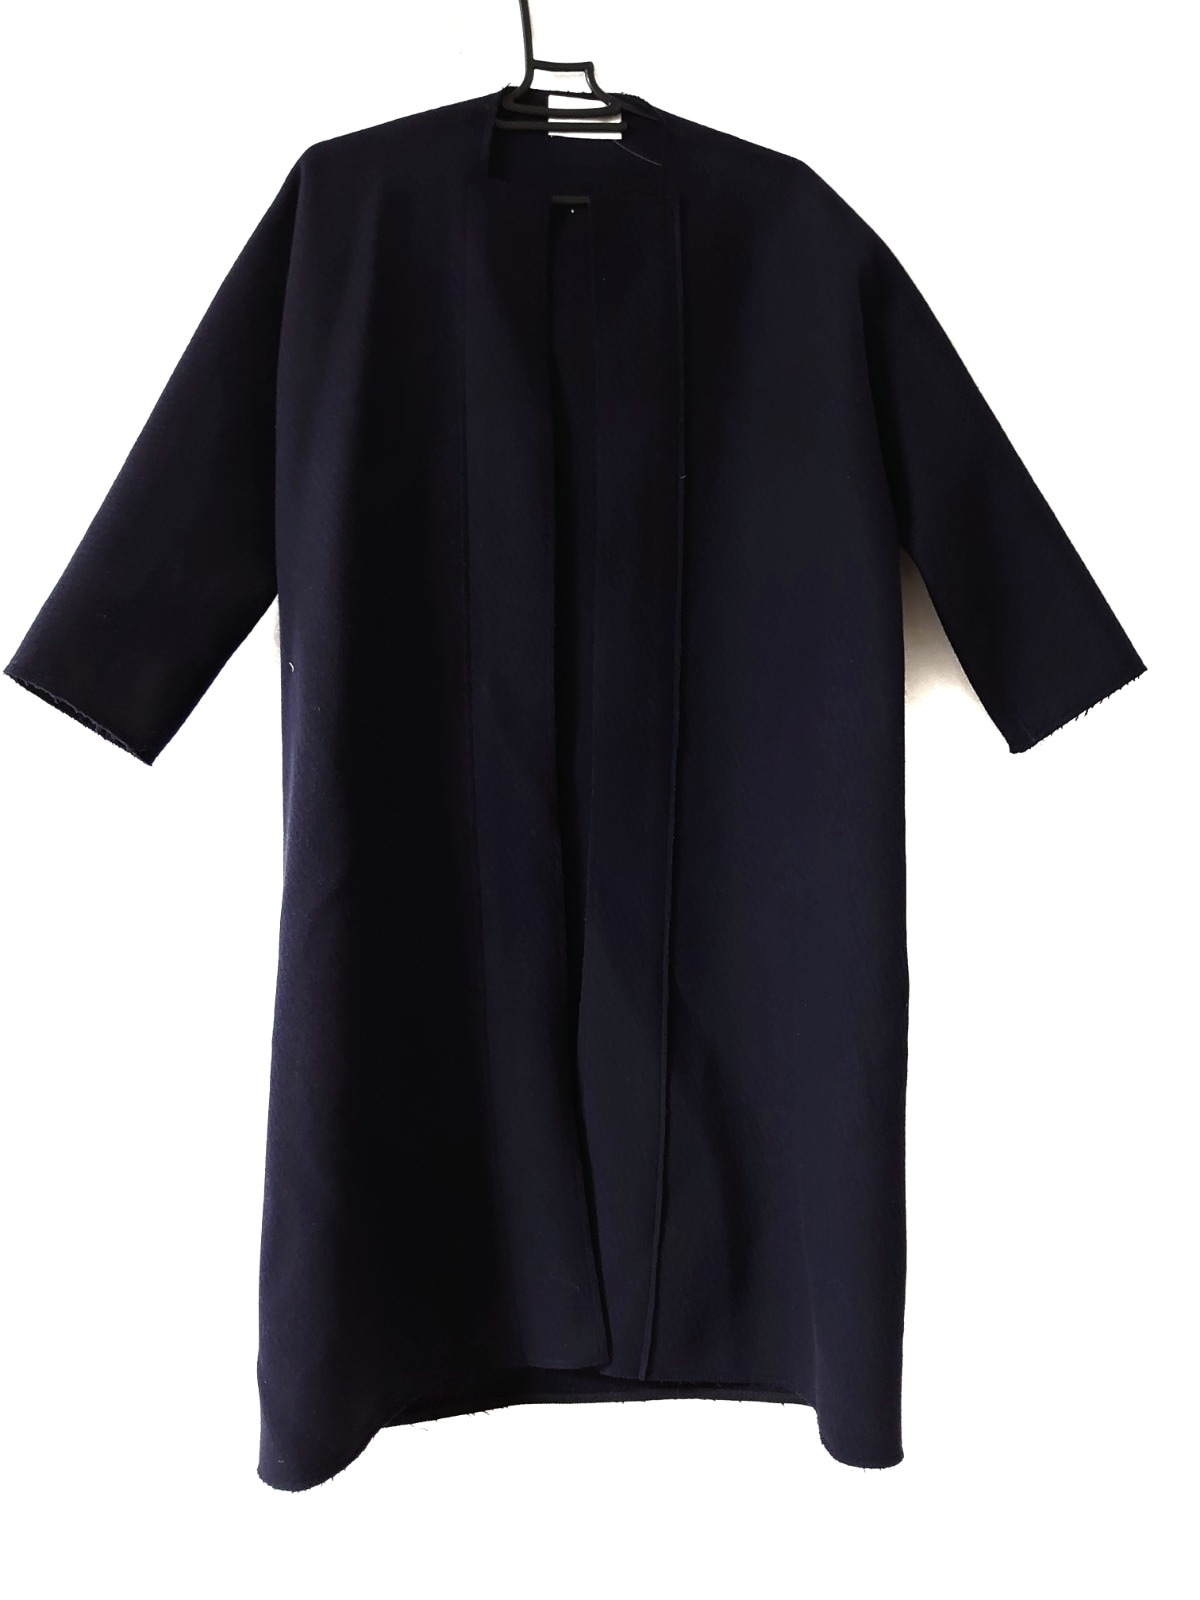 Maison Rabih Kayrouz(メゾンラビカイルー)のコート